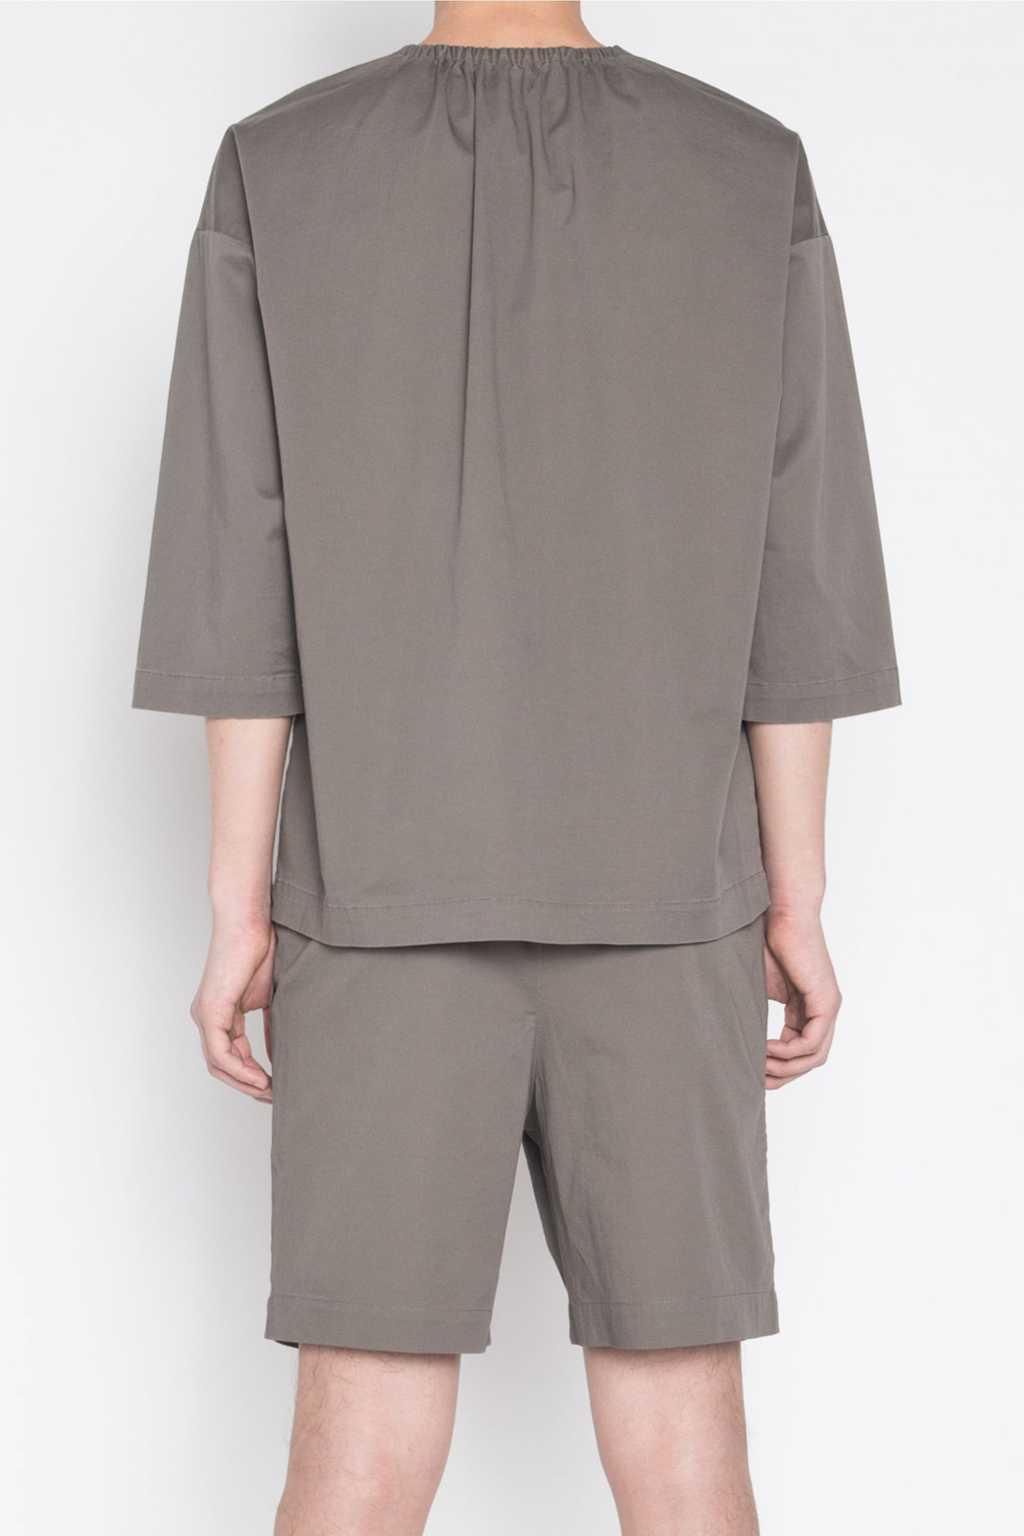 Shirt 1336 Olive 2